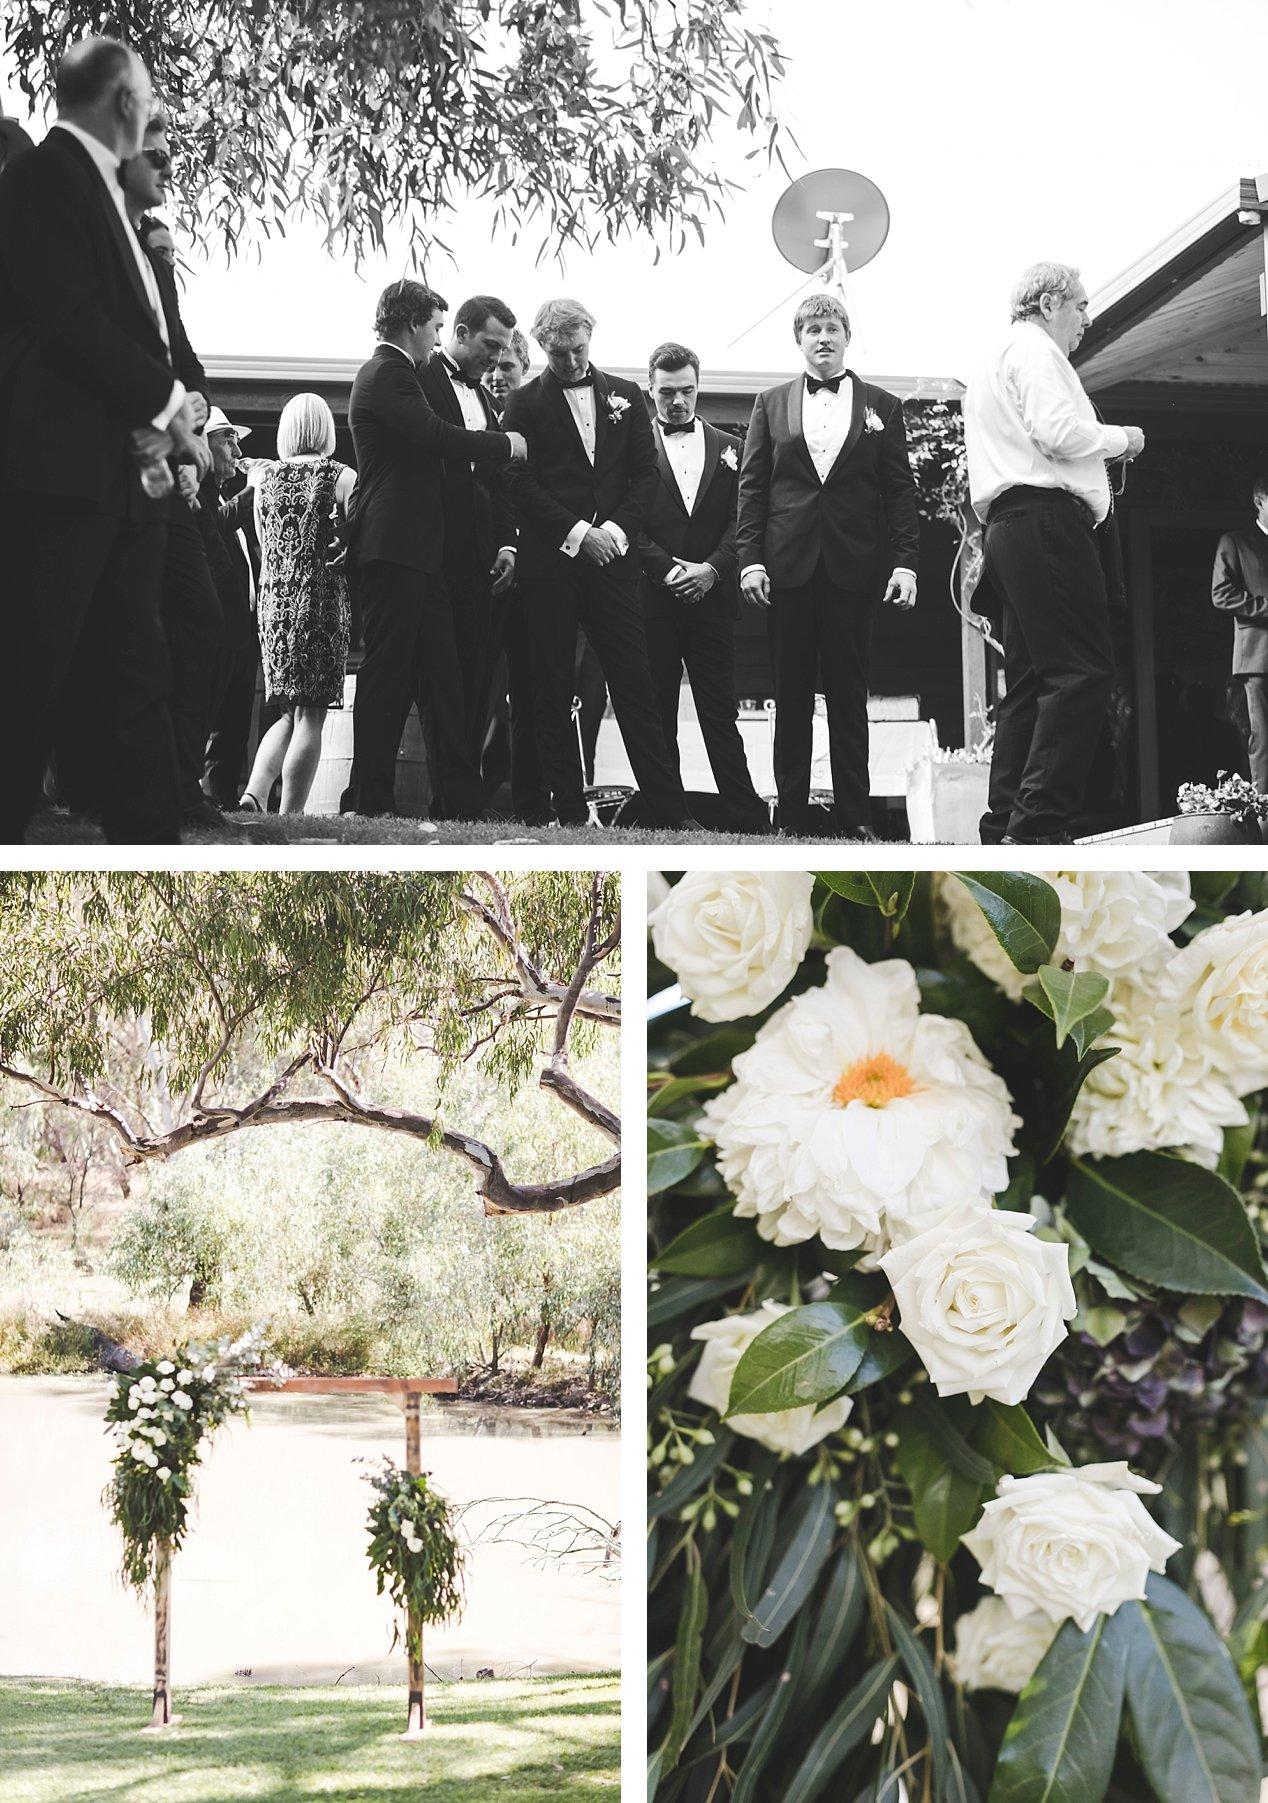 Jerilderie Wedding by Wagga Wagga Wedding Photographer Peppermint Studios_Deniliquin weddings_0069